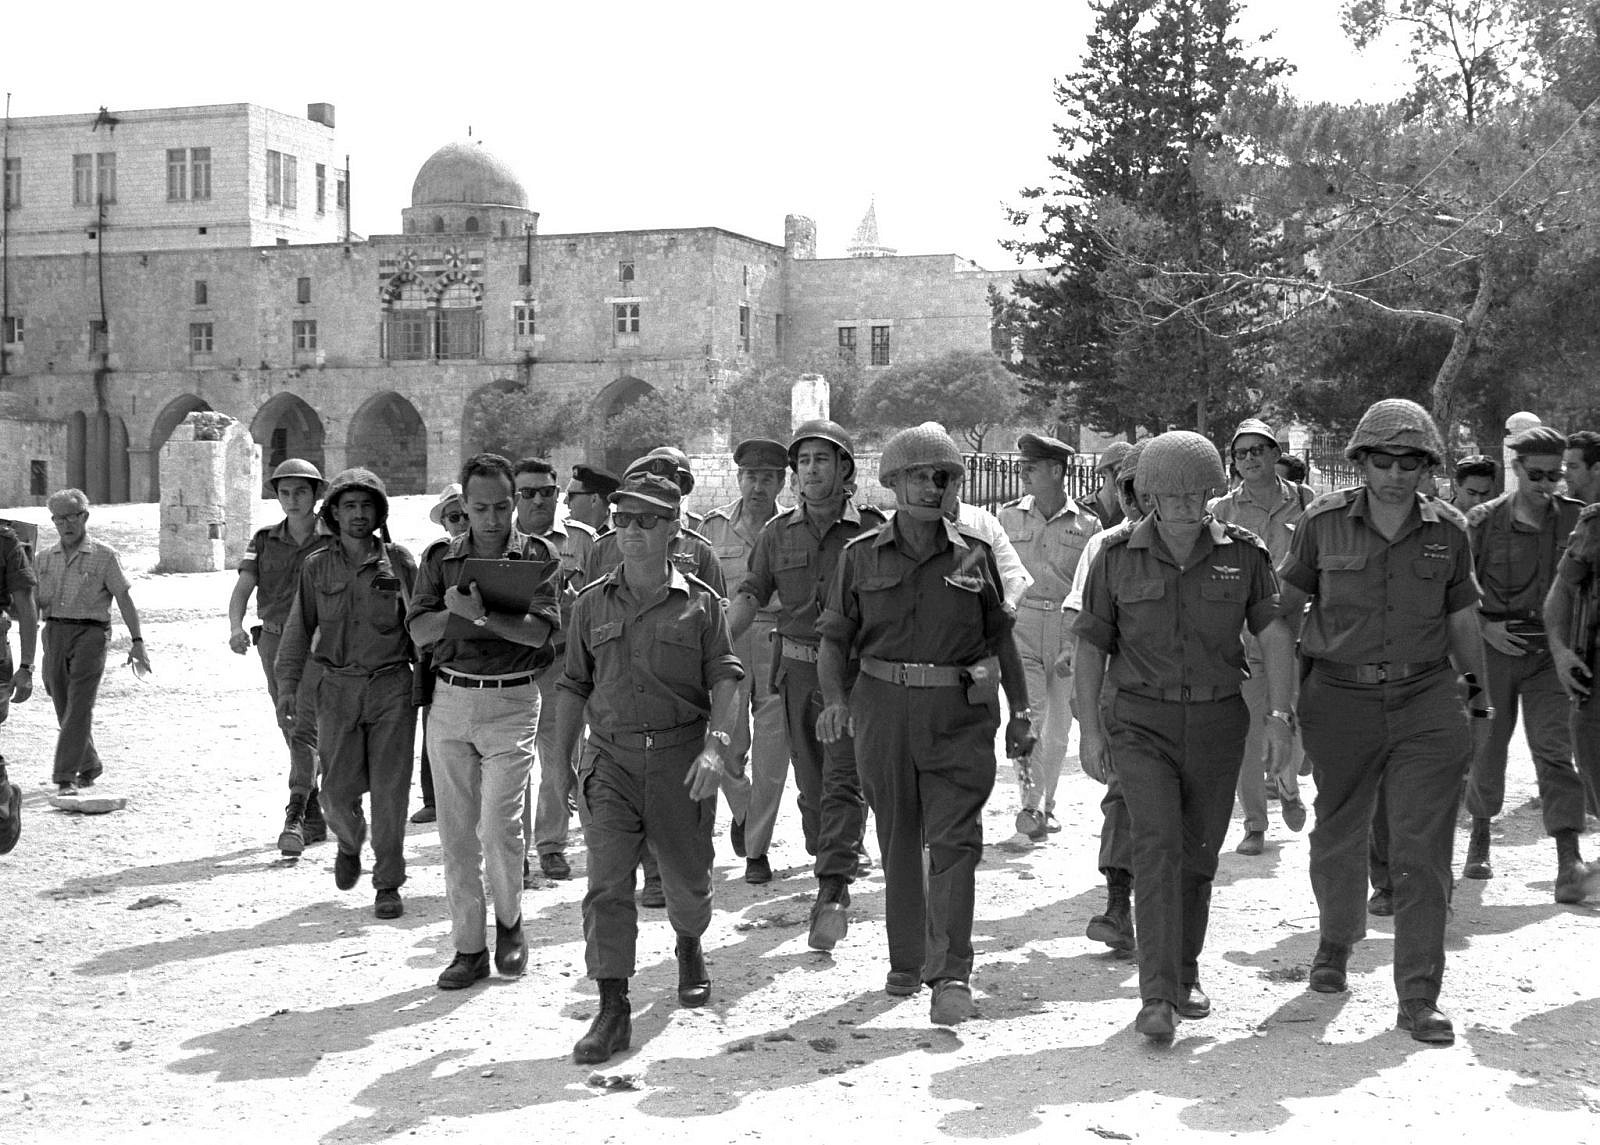 The Six Day War. Defense Minister Moshe Dayan, Chief of Staff Yitzhak Rabin, Gen. Rehavam Ze'evi (right) and Gen. Uzi Narkiss walk through the Old City of Jerusalem, June 7, 1967. (Ilan Bruner / GPO)